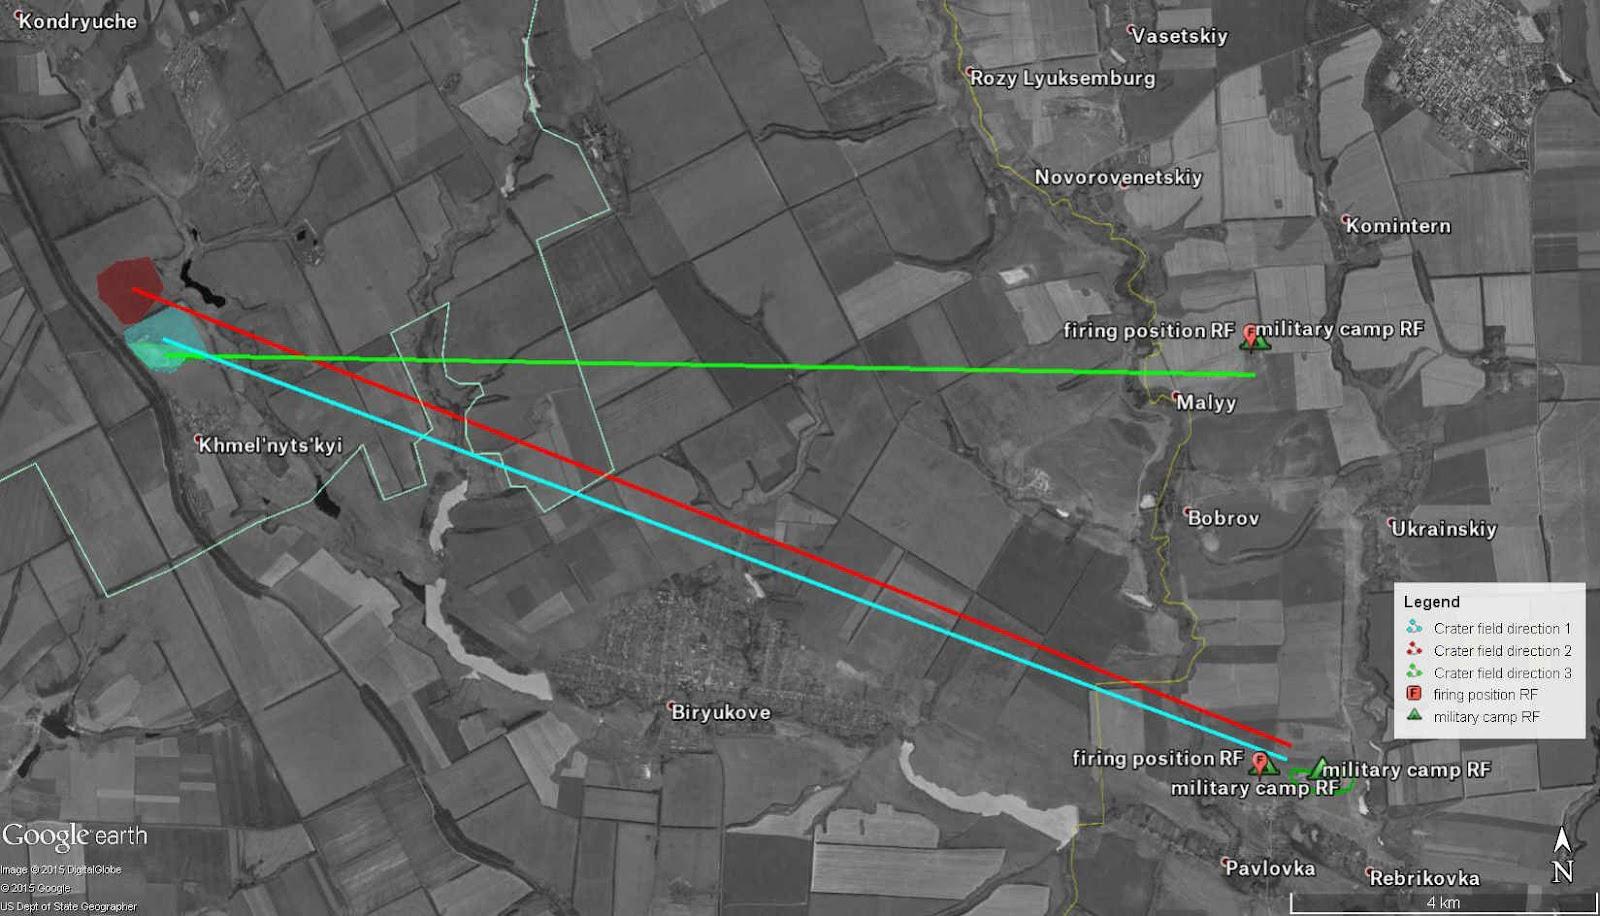 Result of the crater analysis at the village Khmelnytskyi, south of Sverdlovsk